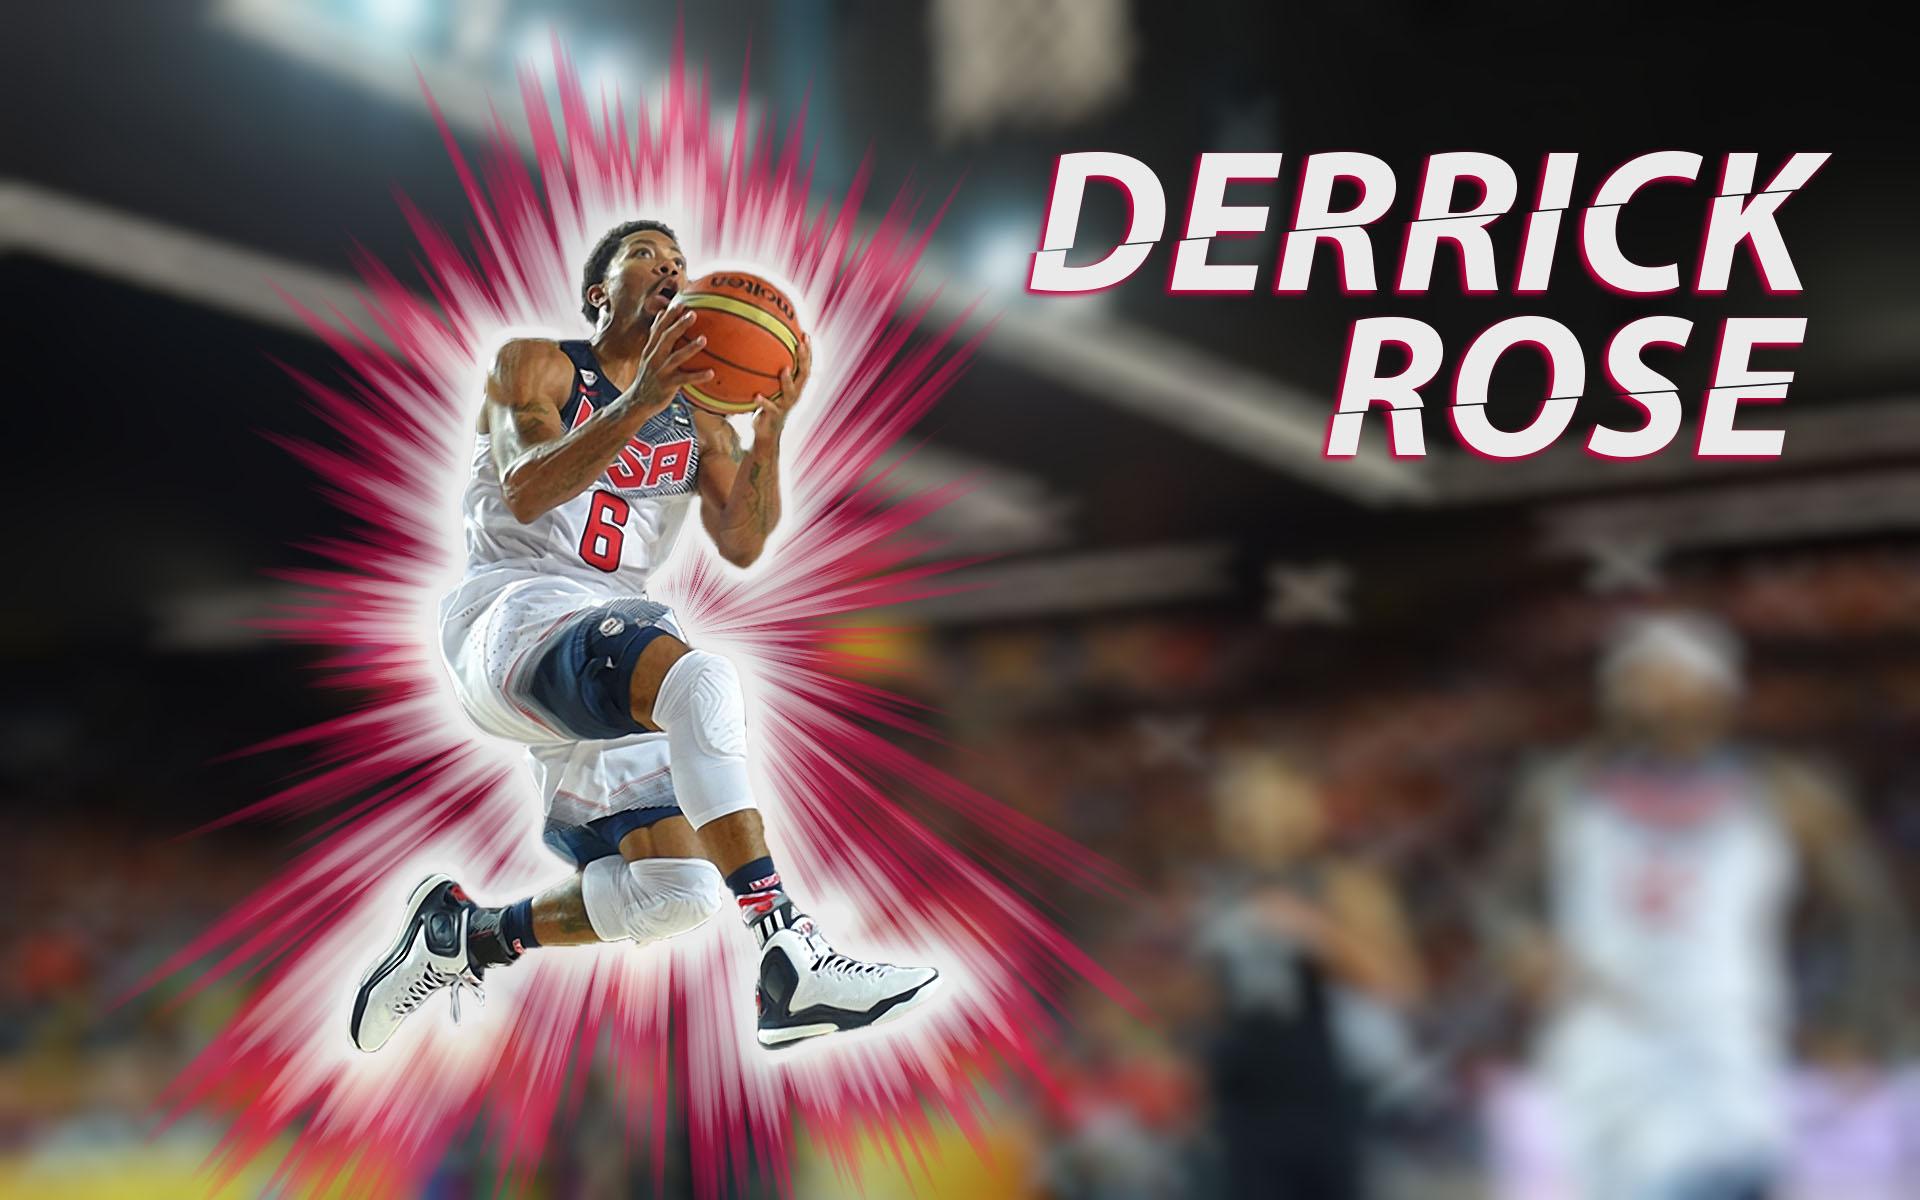 Derrick Rose Wallpapers 2015 1920x1200